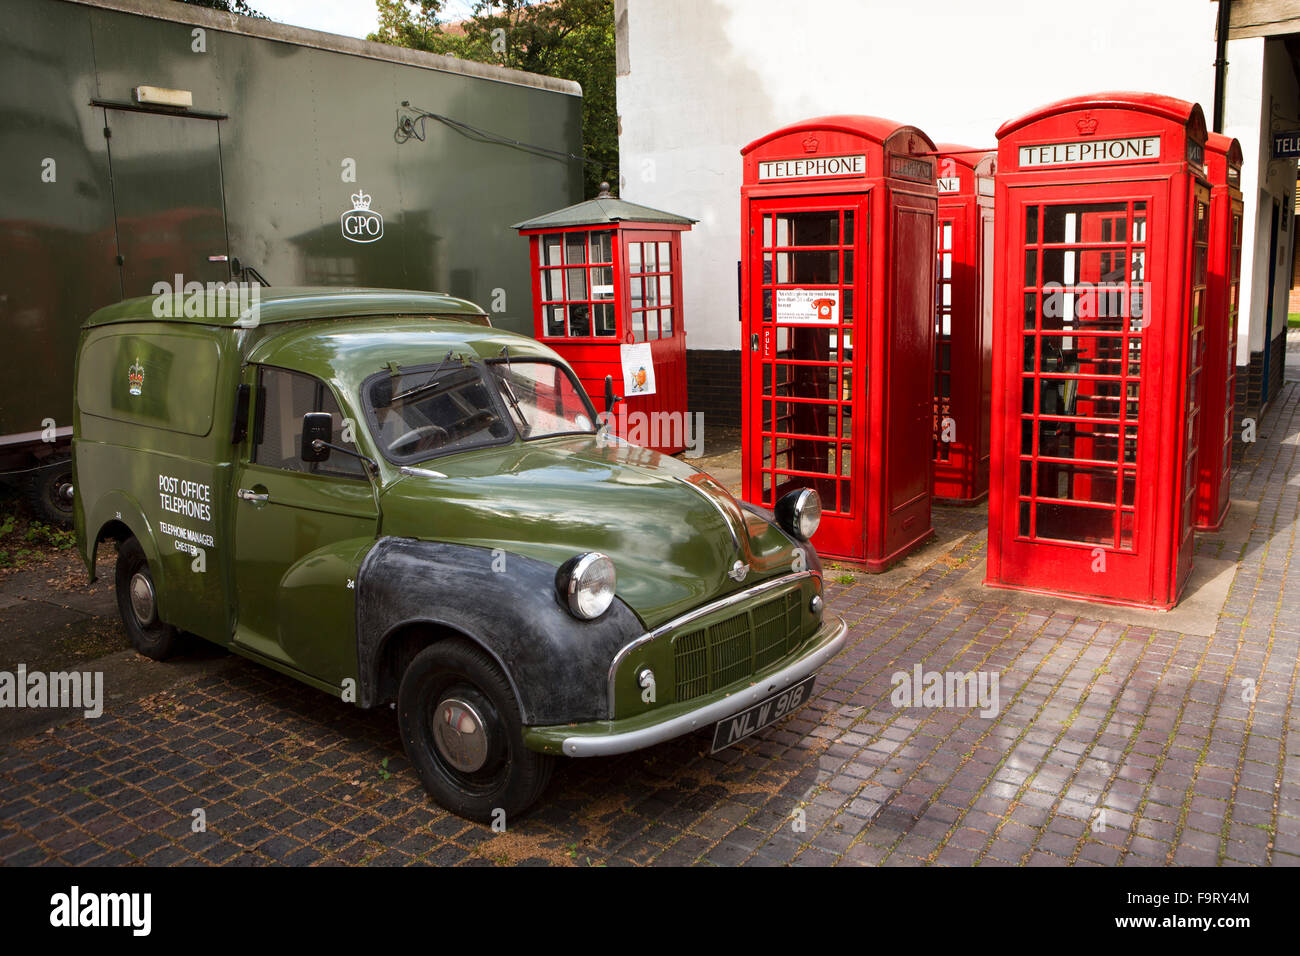 UK, England, Worcestershire, Bromsgrove, Avoncroft Museum, National Telephone Kiosk Collection, K6 boxes, GPO Morris - Stock Image